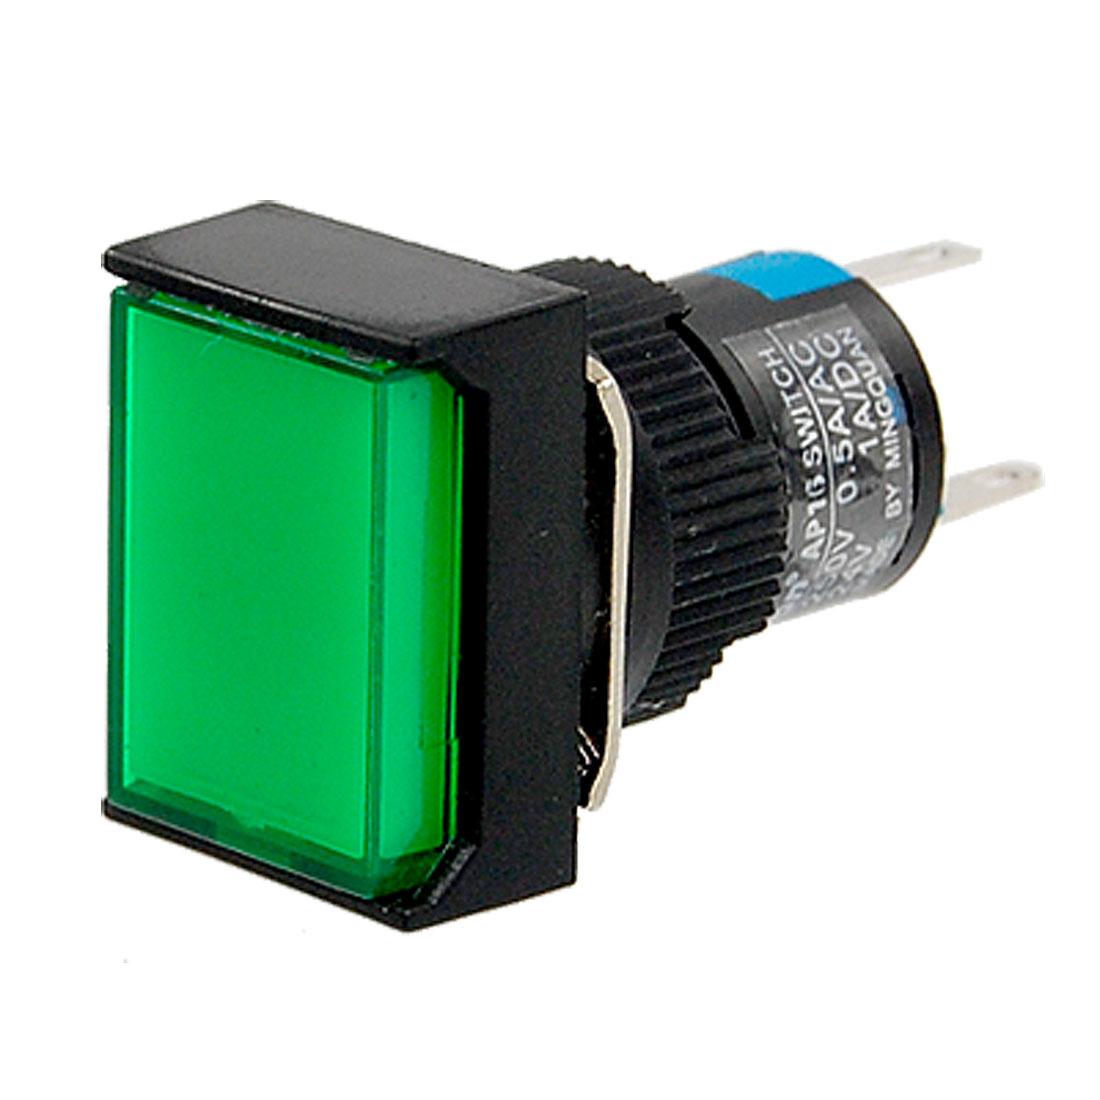 AC 220V Self-locking Type Green Cap Push Button Switch w Lamp